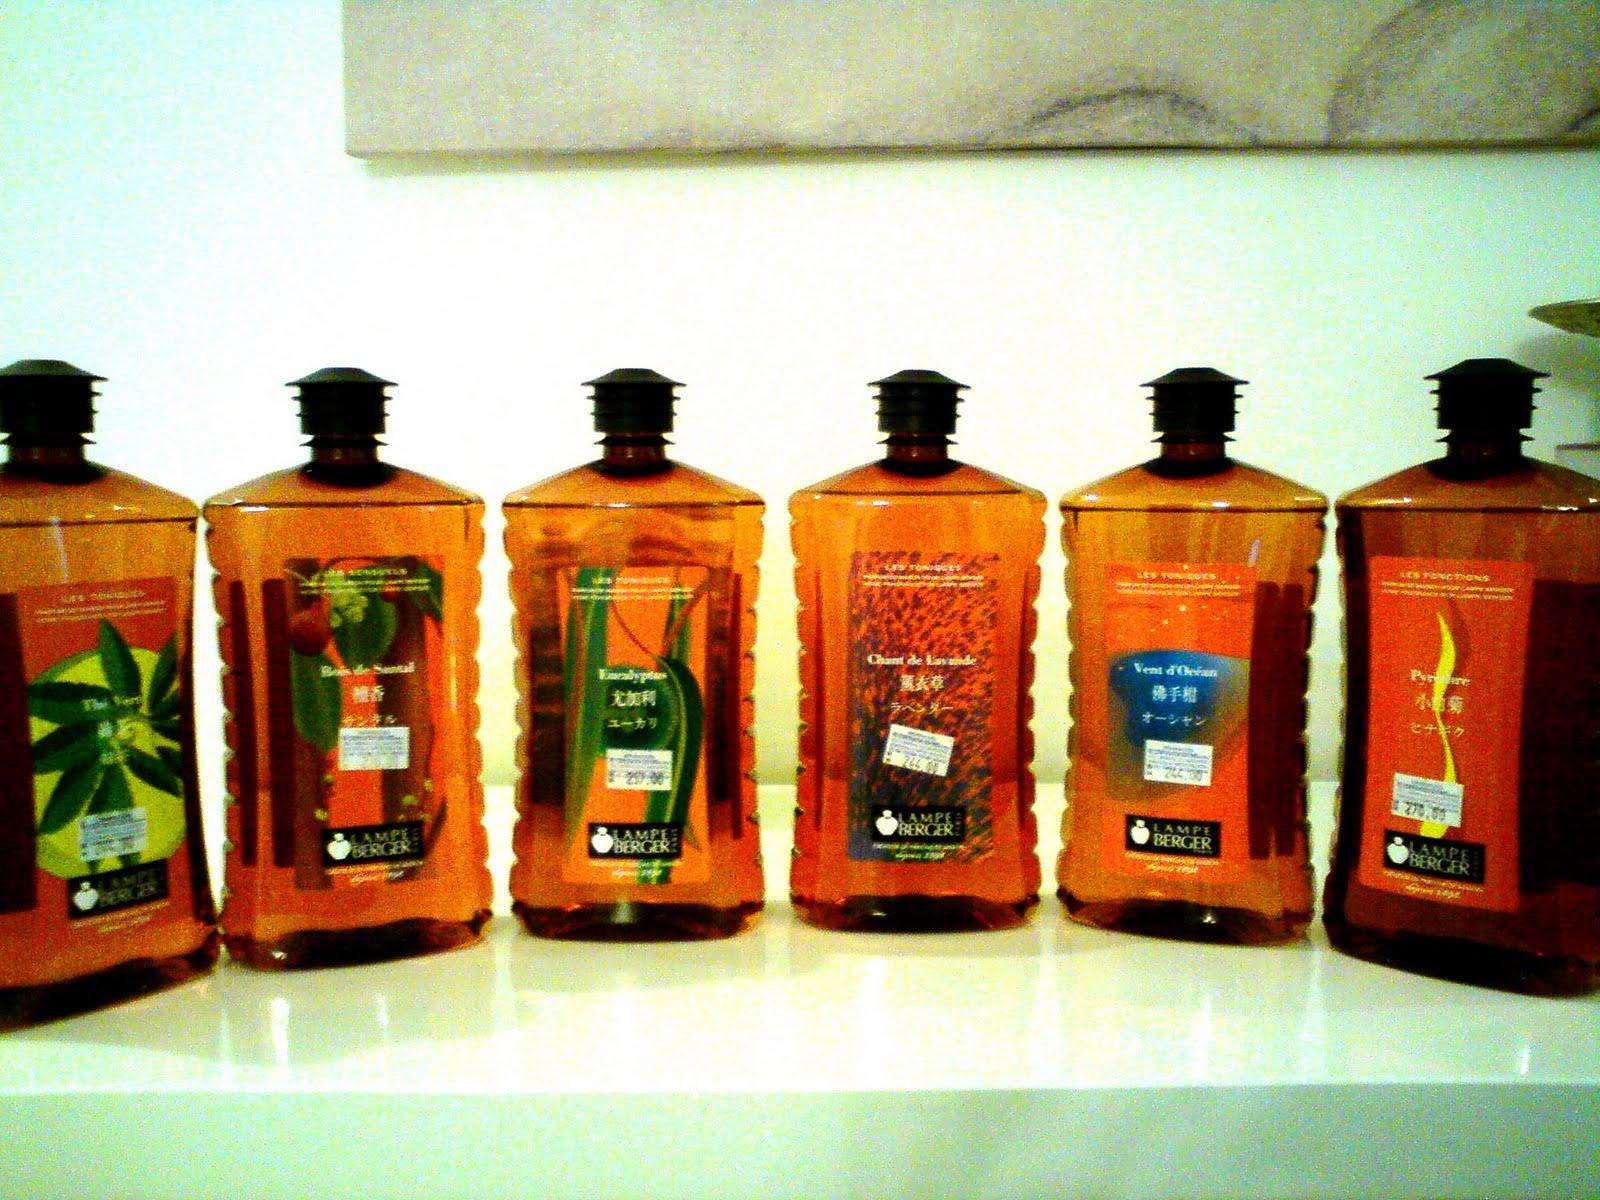 lampe berger essential oil discount. Black Bedroom Furniture Sets. Home Design Ideas